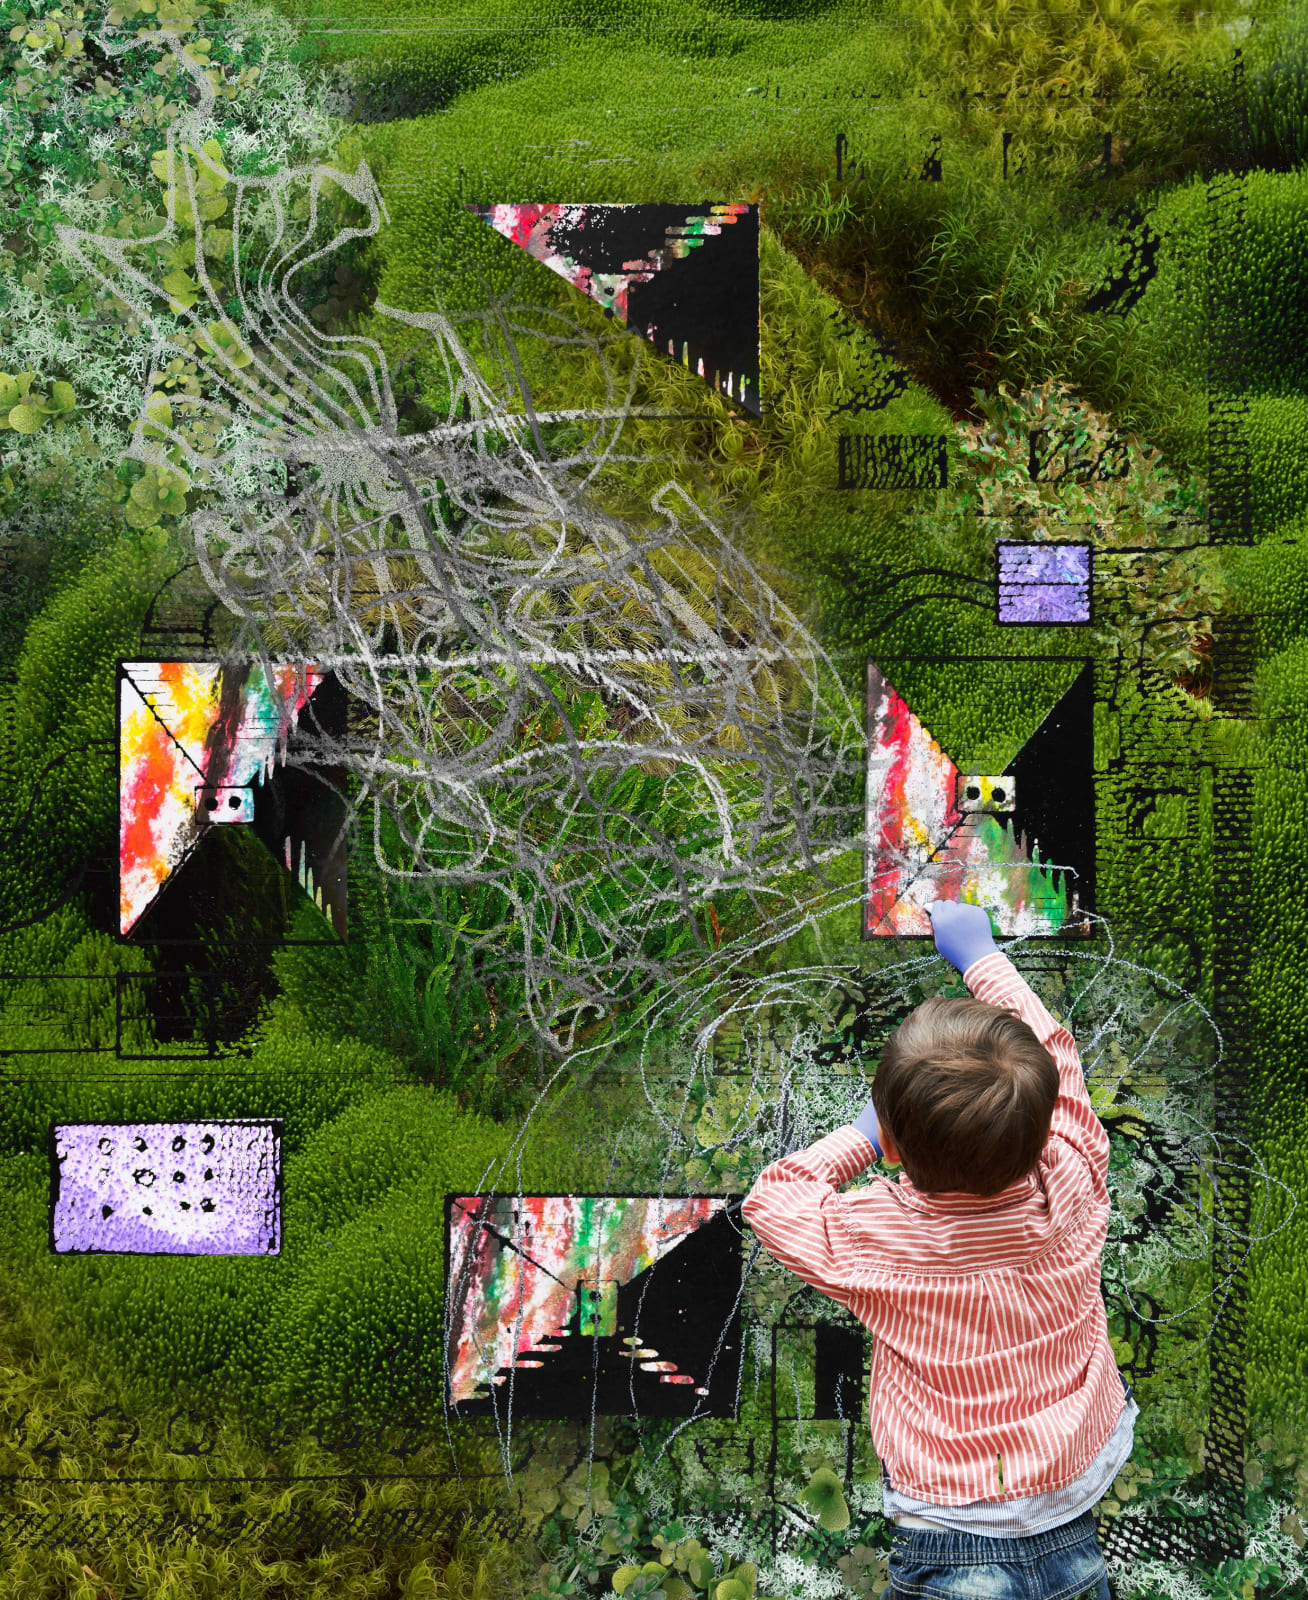 Jacques Louis Vidal, Moss Child. 2020, digital collage, dimensions variable.